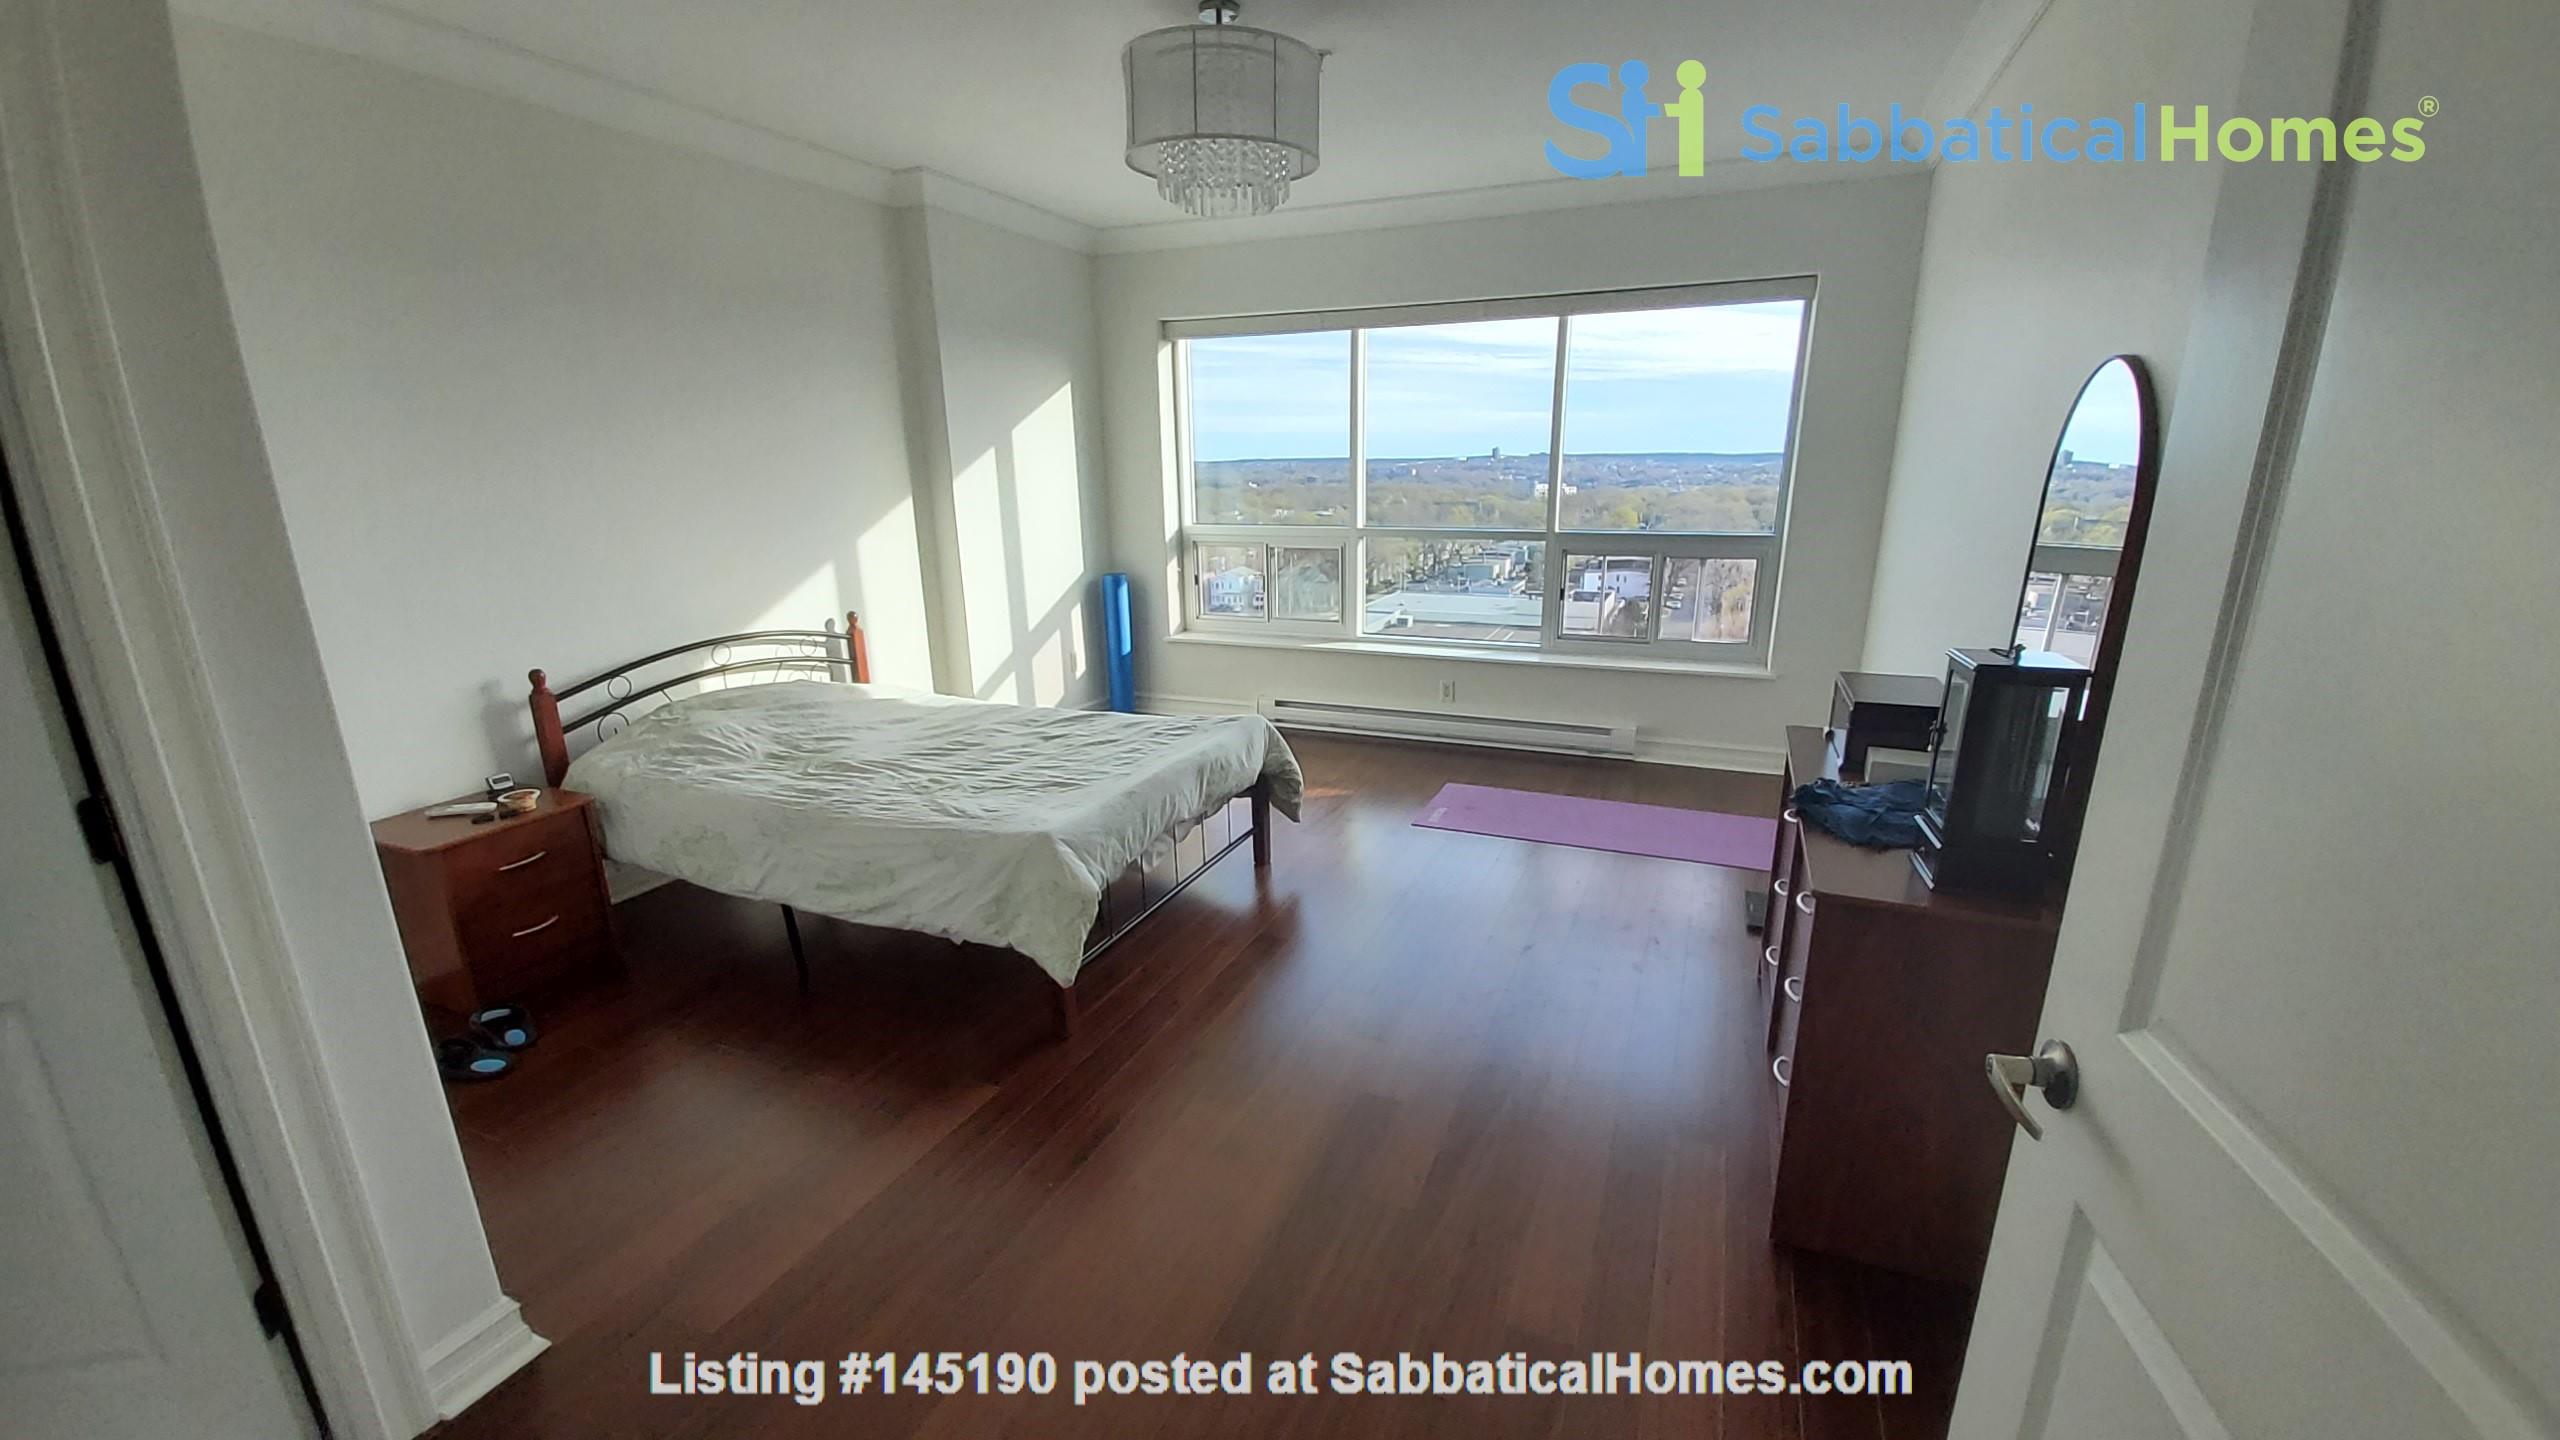 Spacious, Sunny, 12th-floor Condo in the North End of Halifax, Nova Scotia Home Rental in Halifax, Nova Scotia, Canada 7